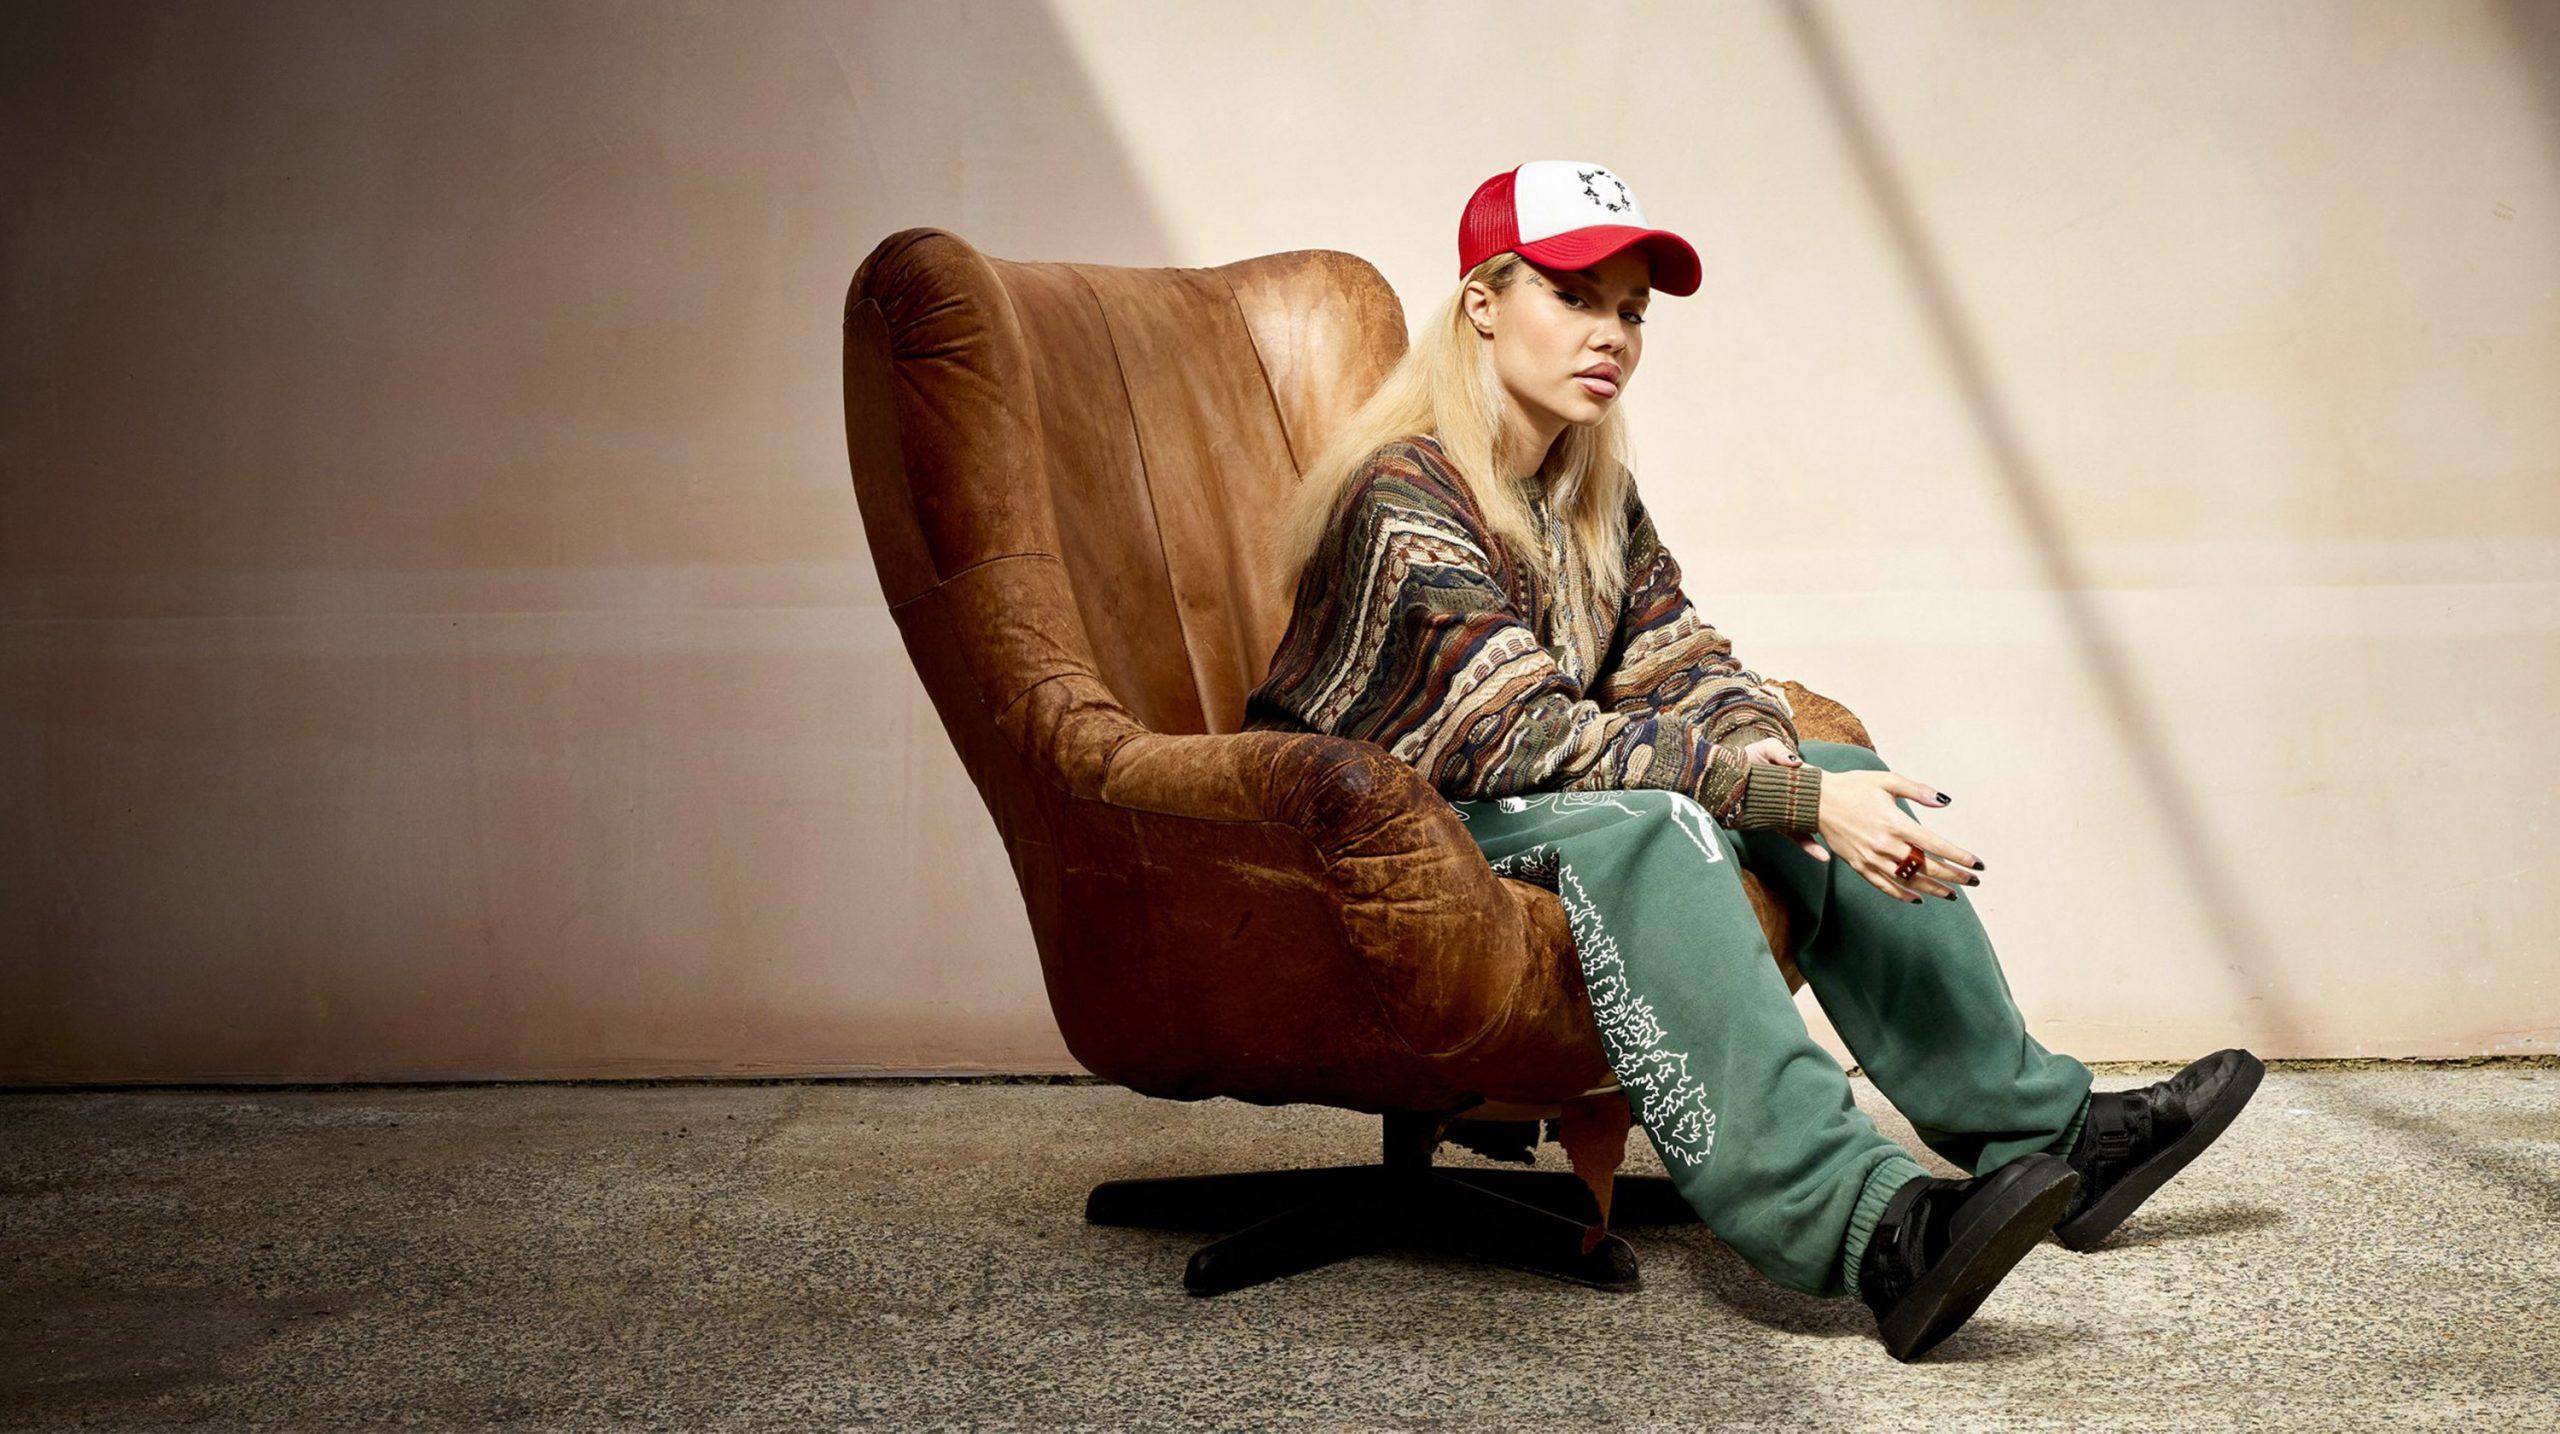 JGRREY sat in a worn brown leather arm chair